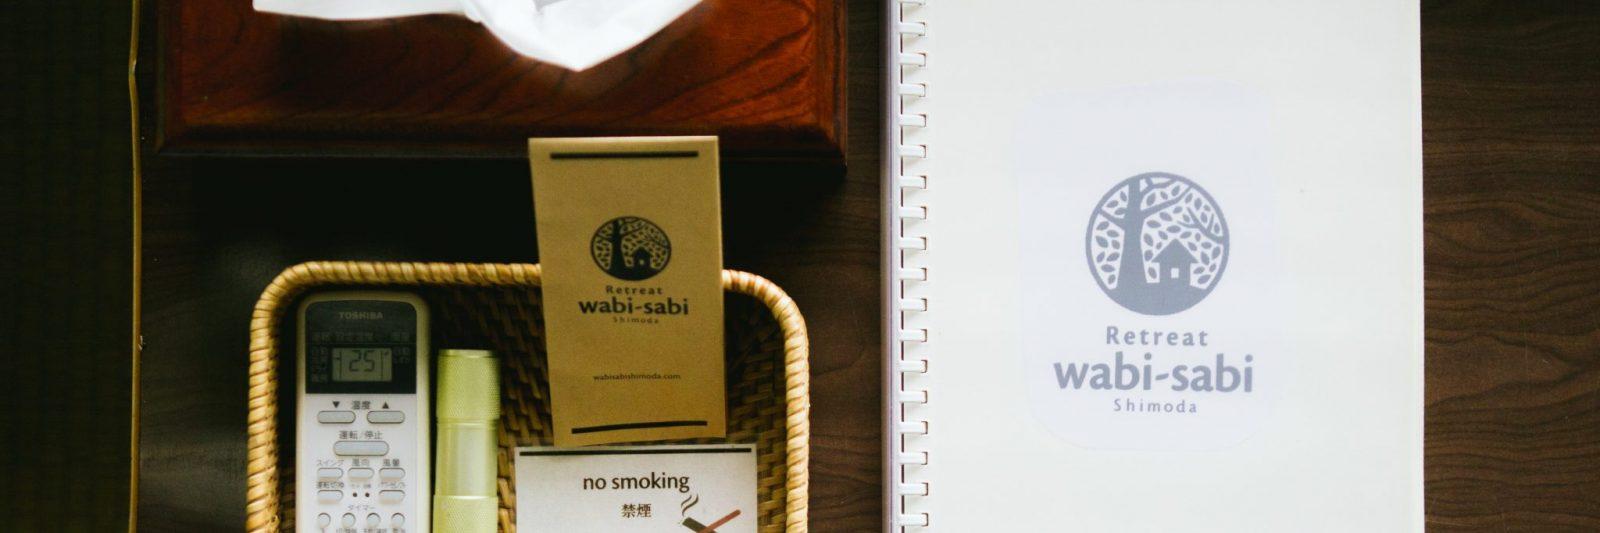 Retreat wabi-sabi guestroom supplies